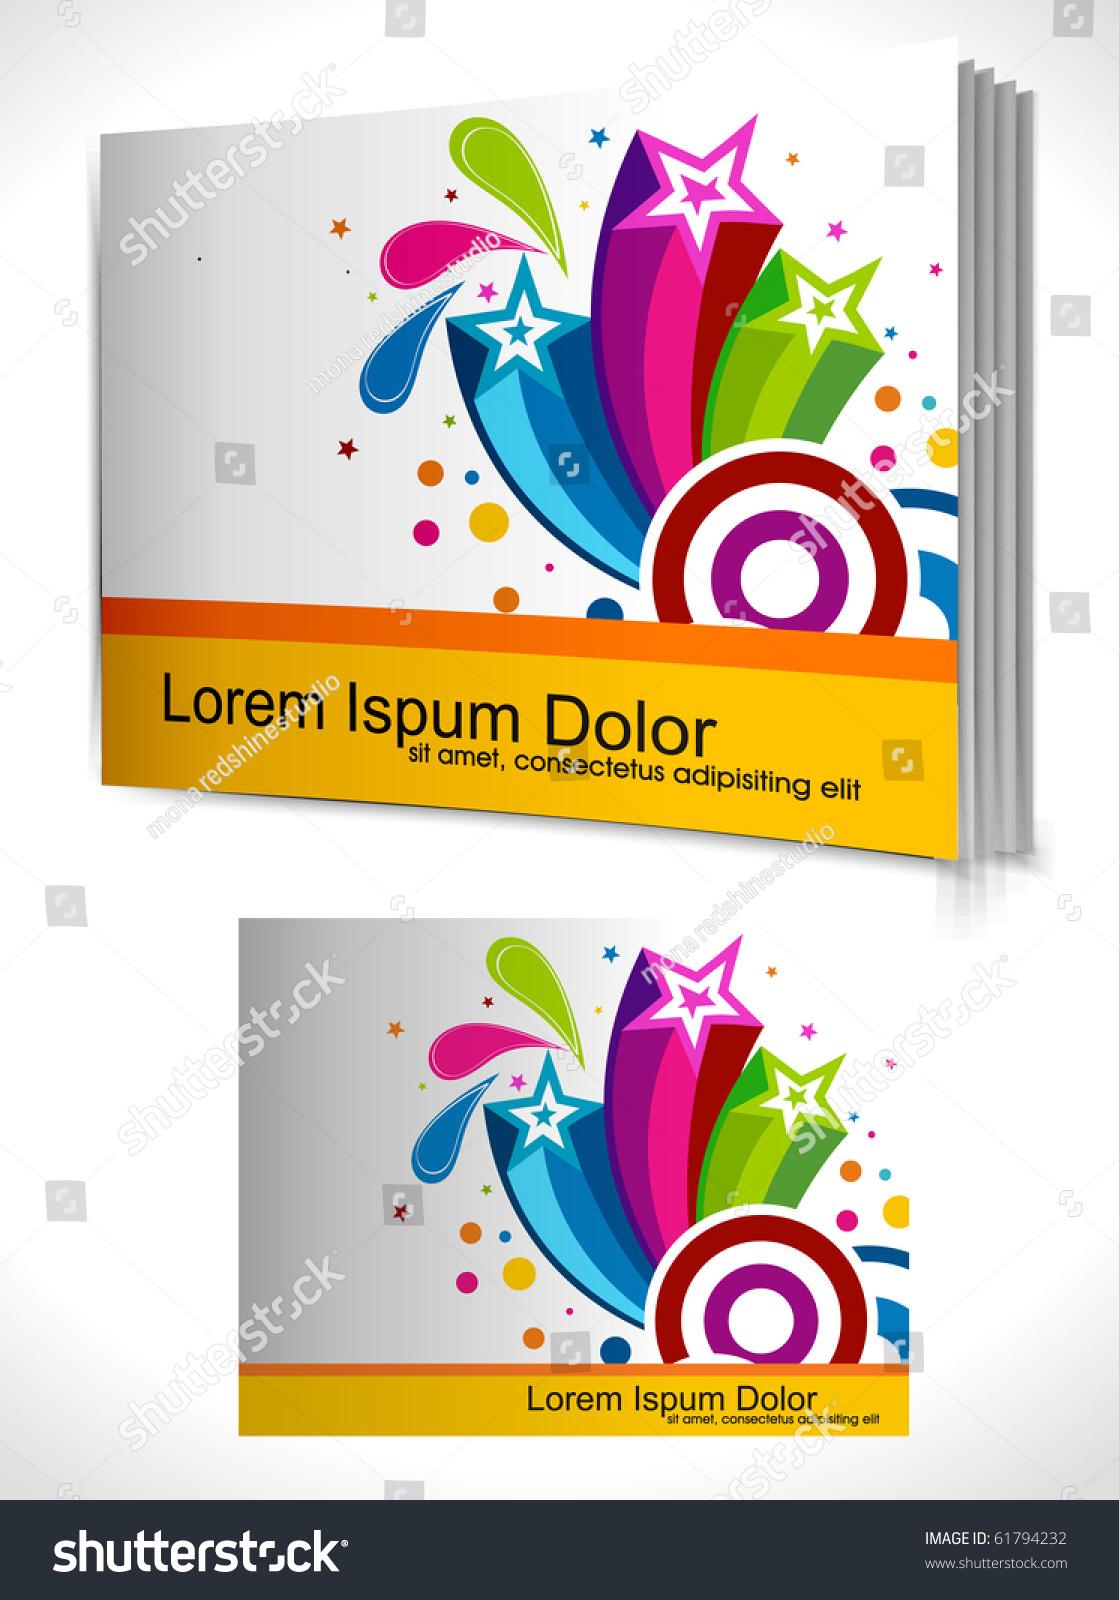 Book Cover Design Vector Template ~ Book cover design template vector illustration stock